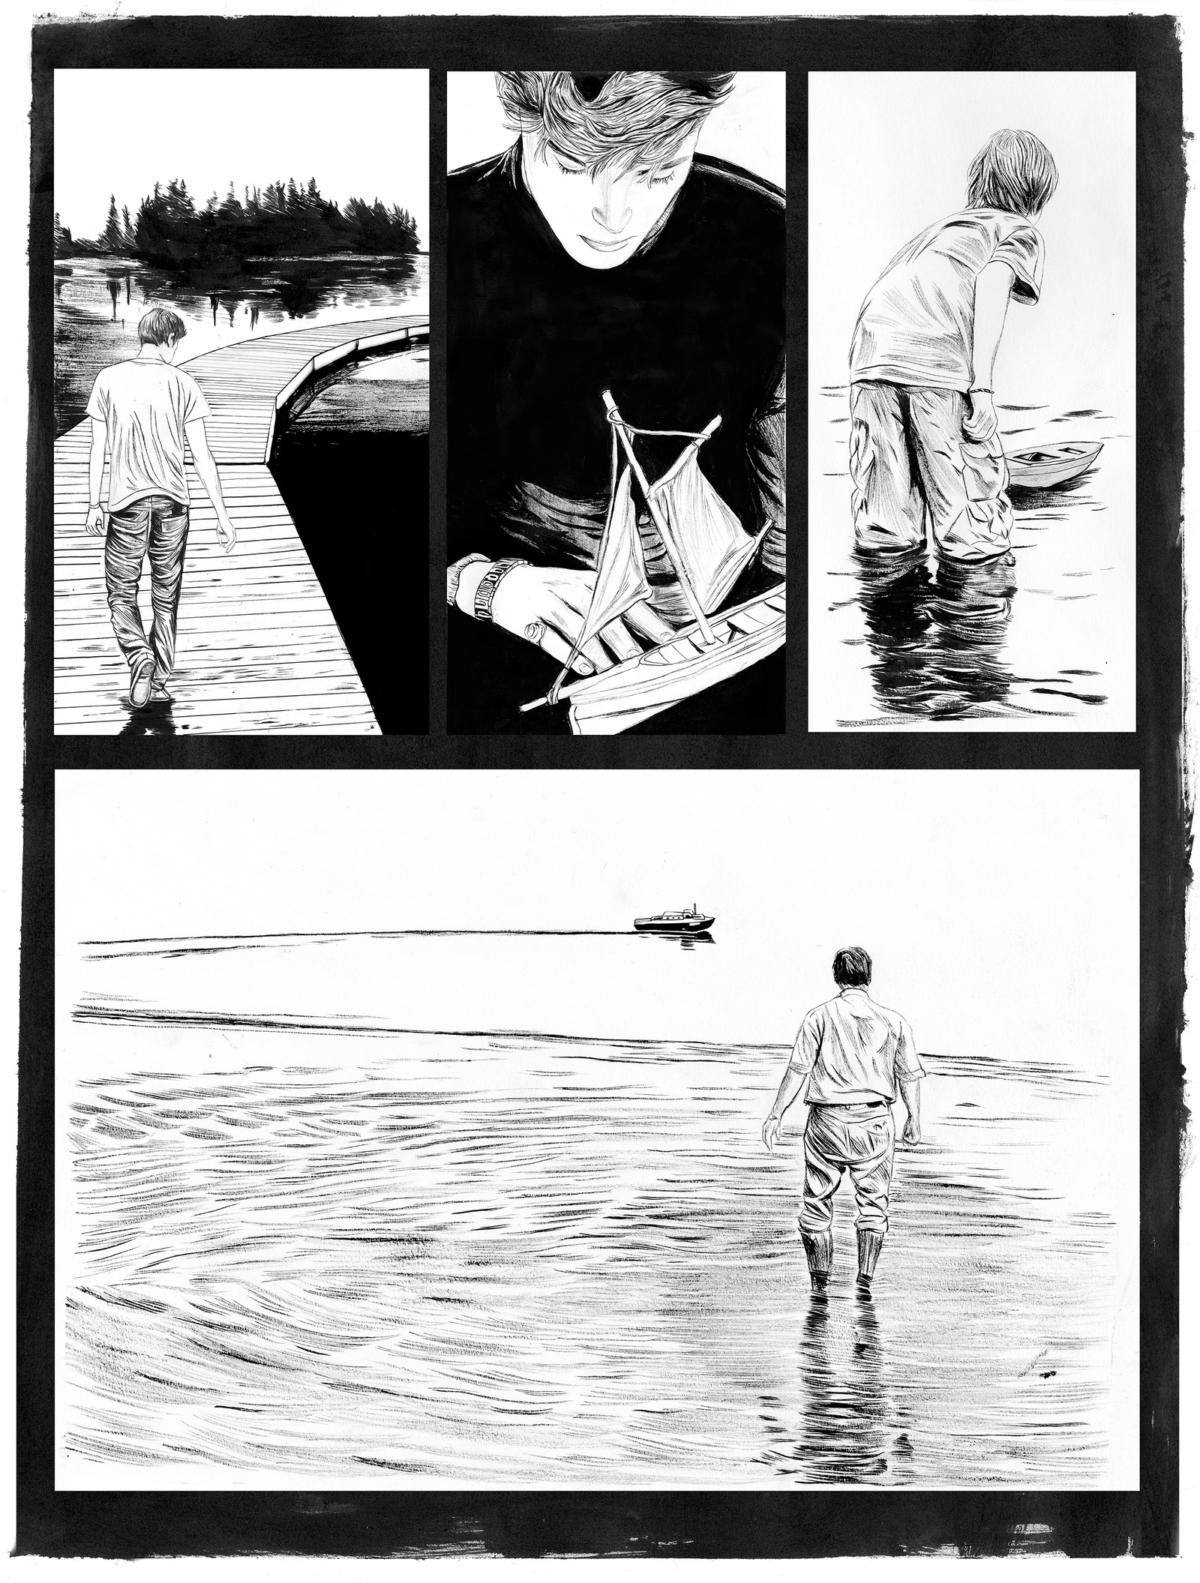 Inspiring Portrait and Narrative Illustrations by Zach Meyer